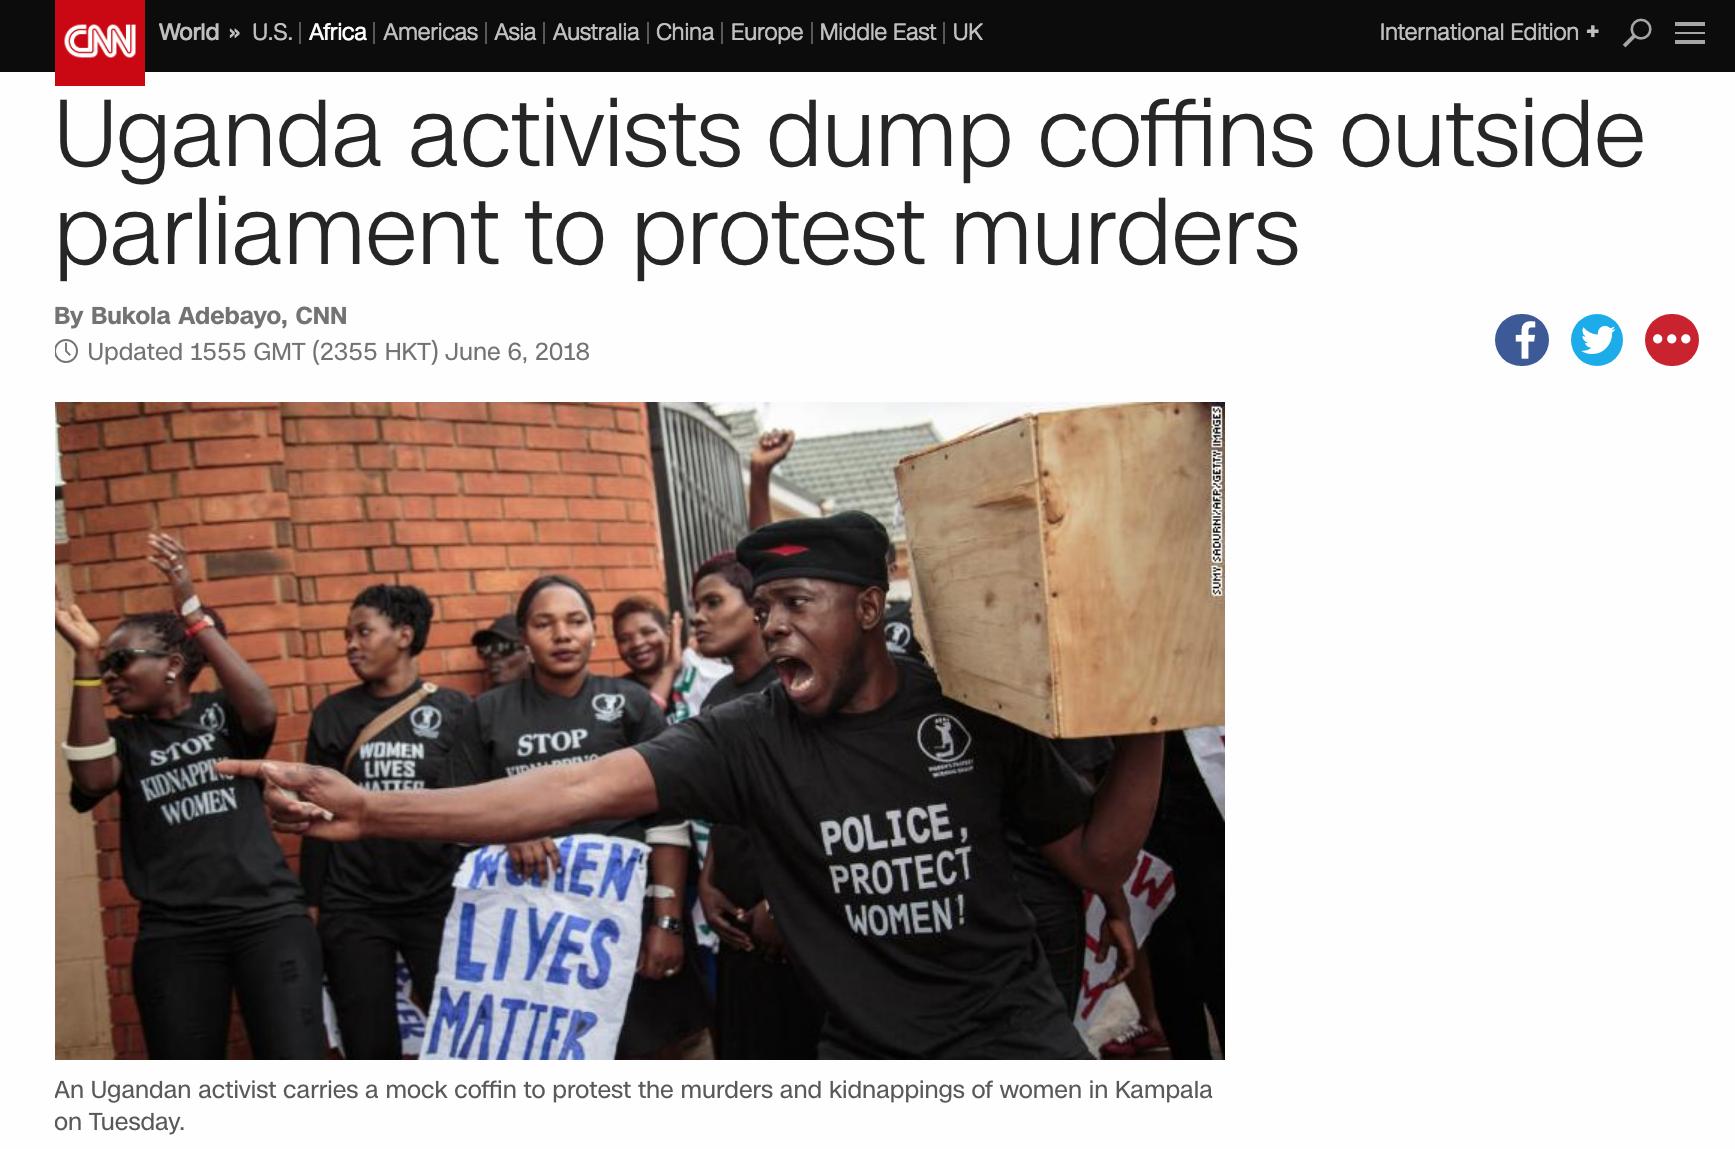 Women Lives Matter protests in Kampala // CNN // 06.2018